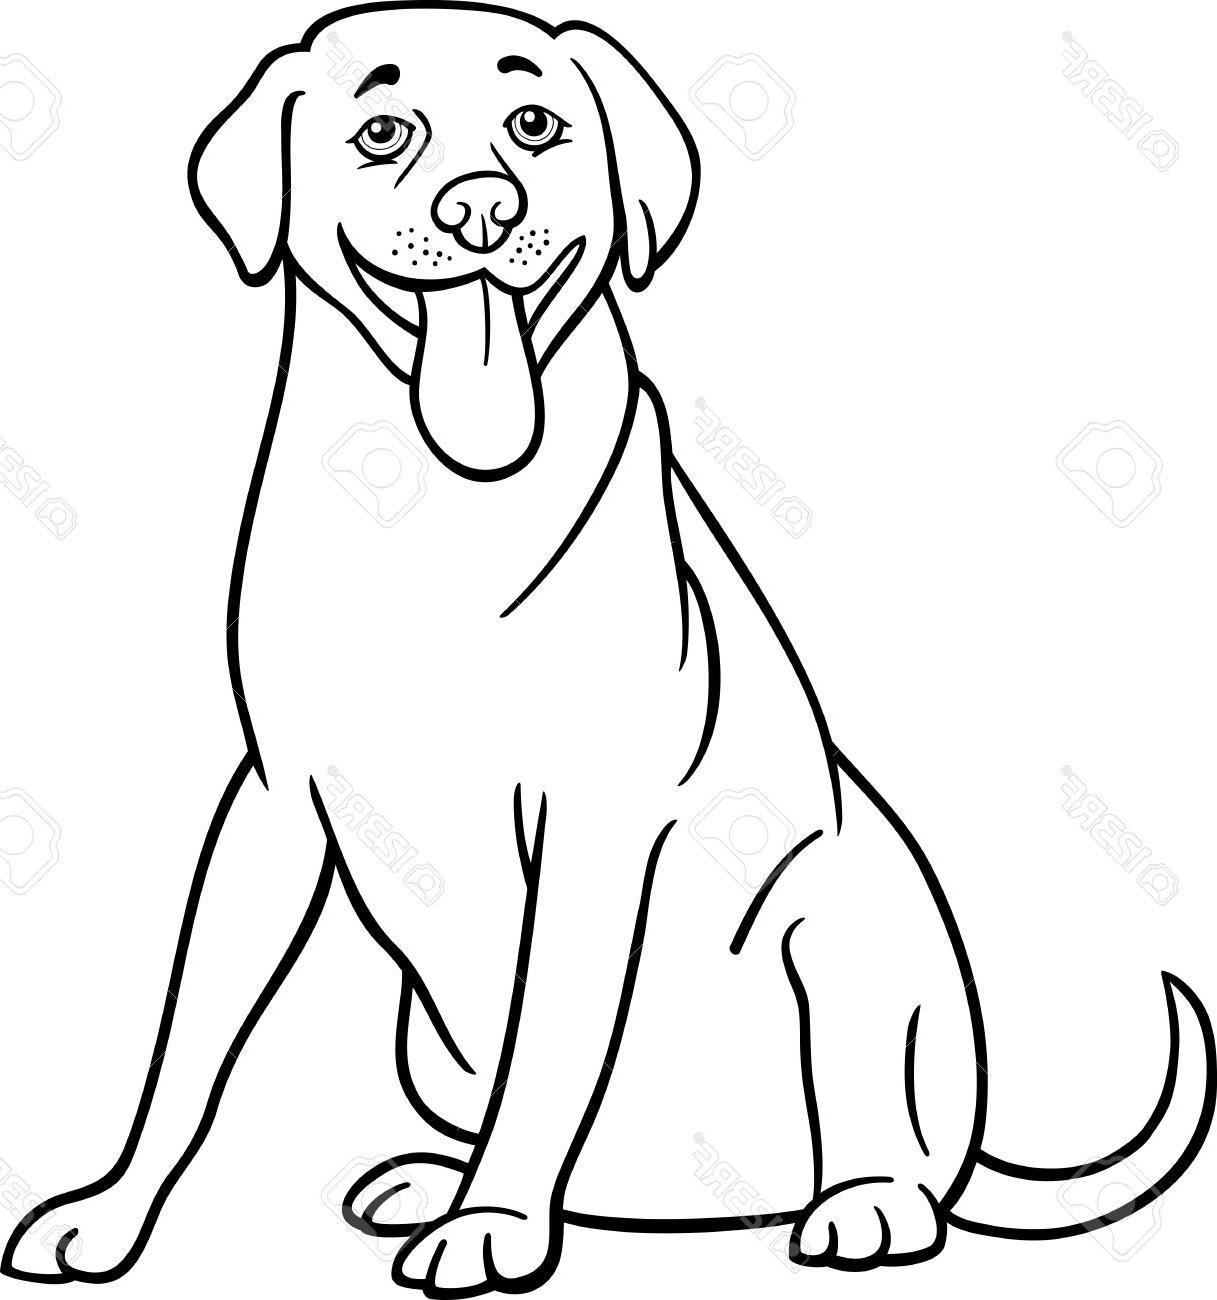 Labrador Silhouette Clip Art At Getdrawings